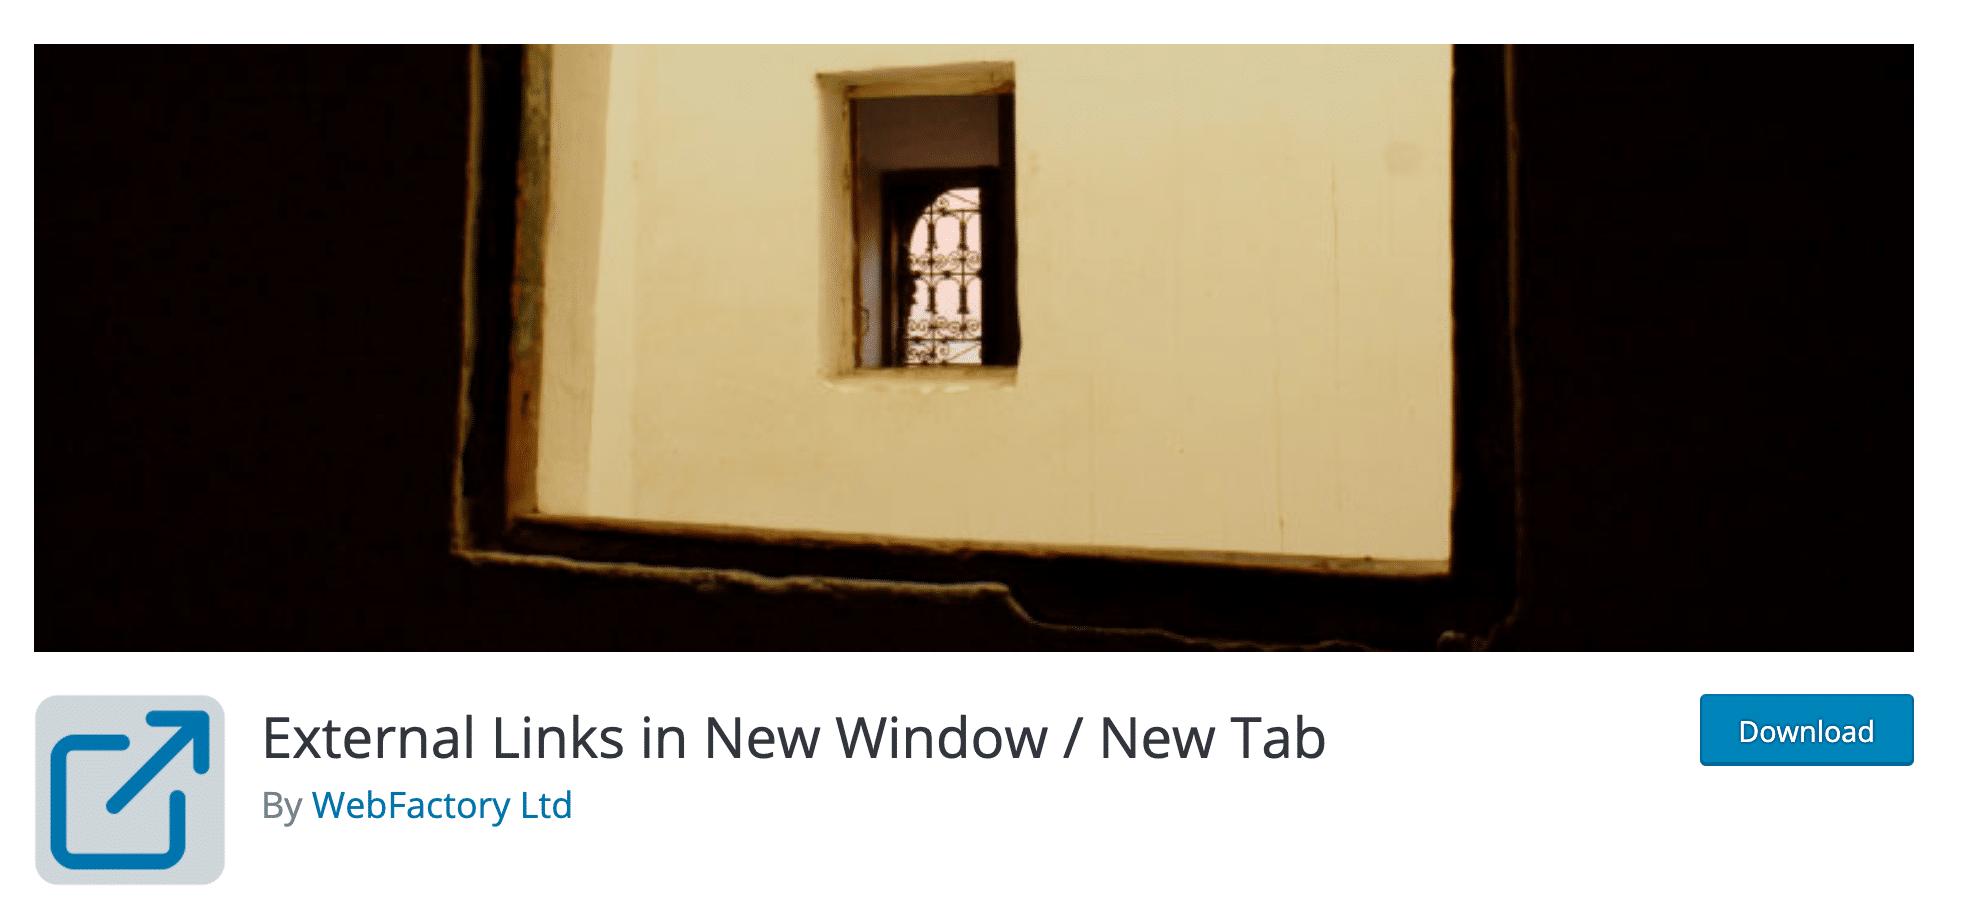 External Links In New Window : New Tab